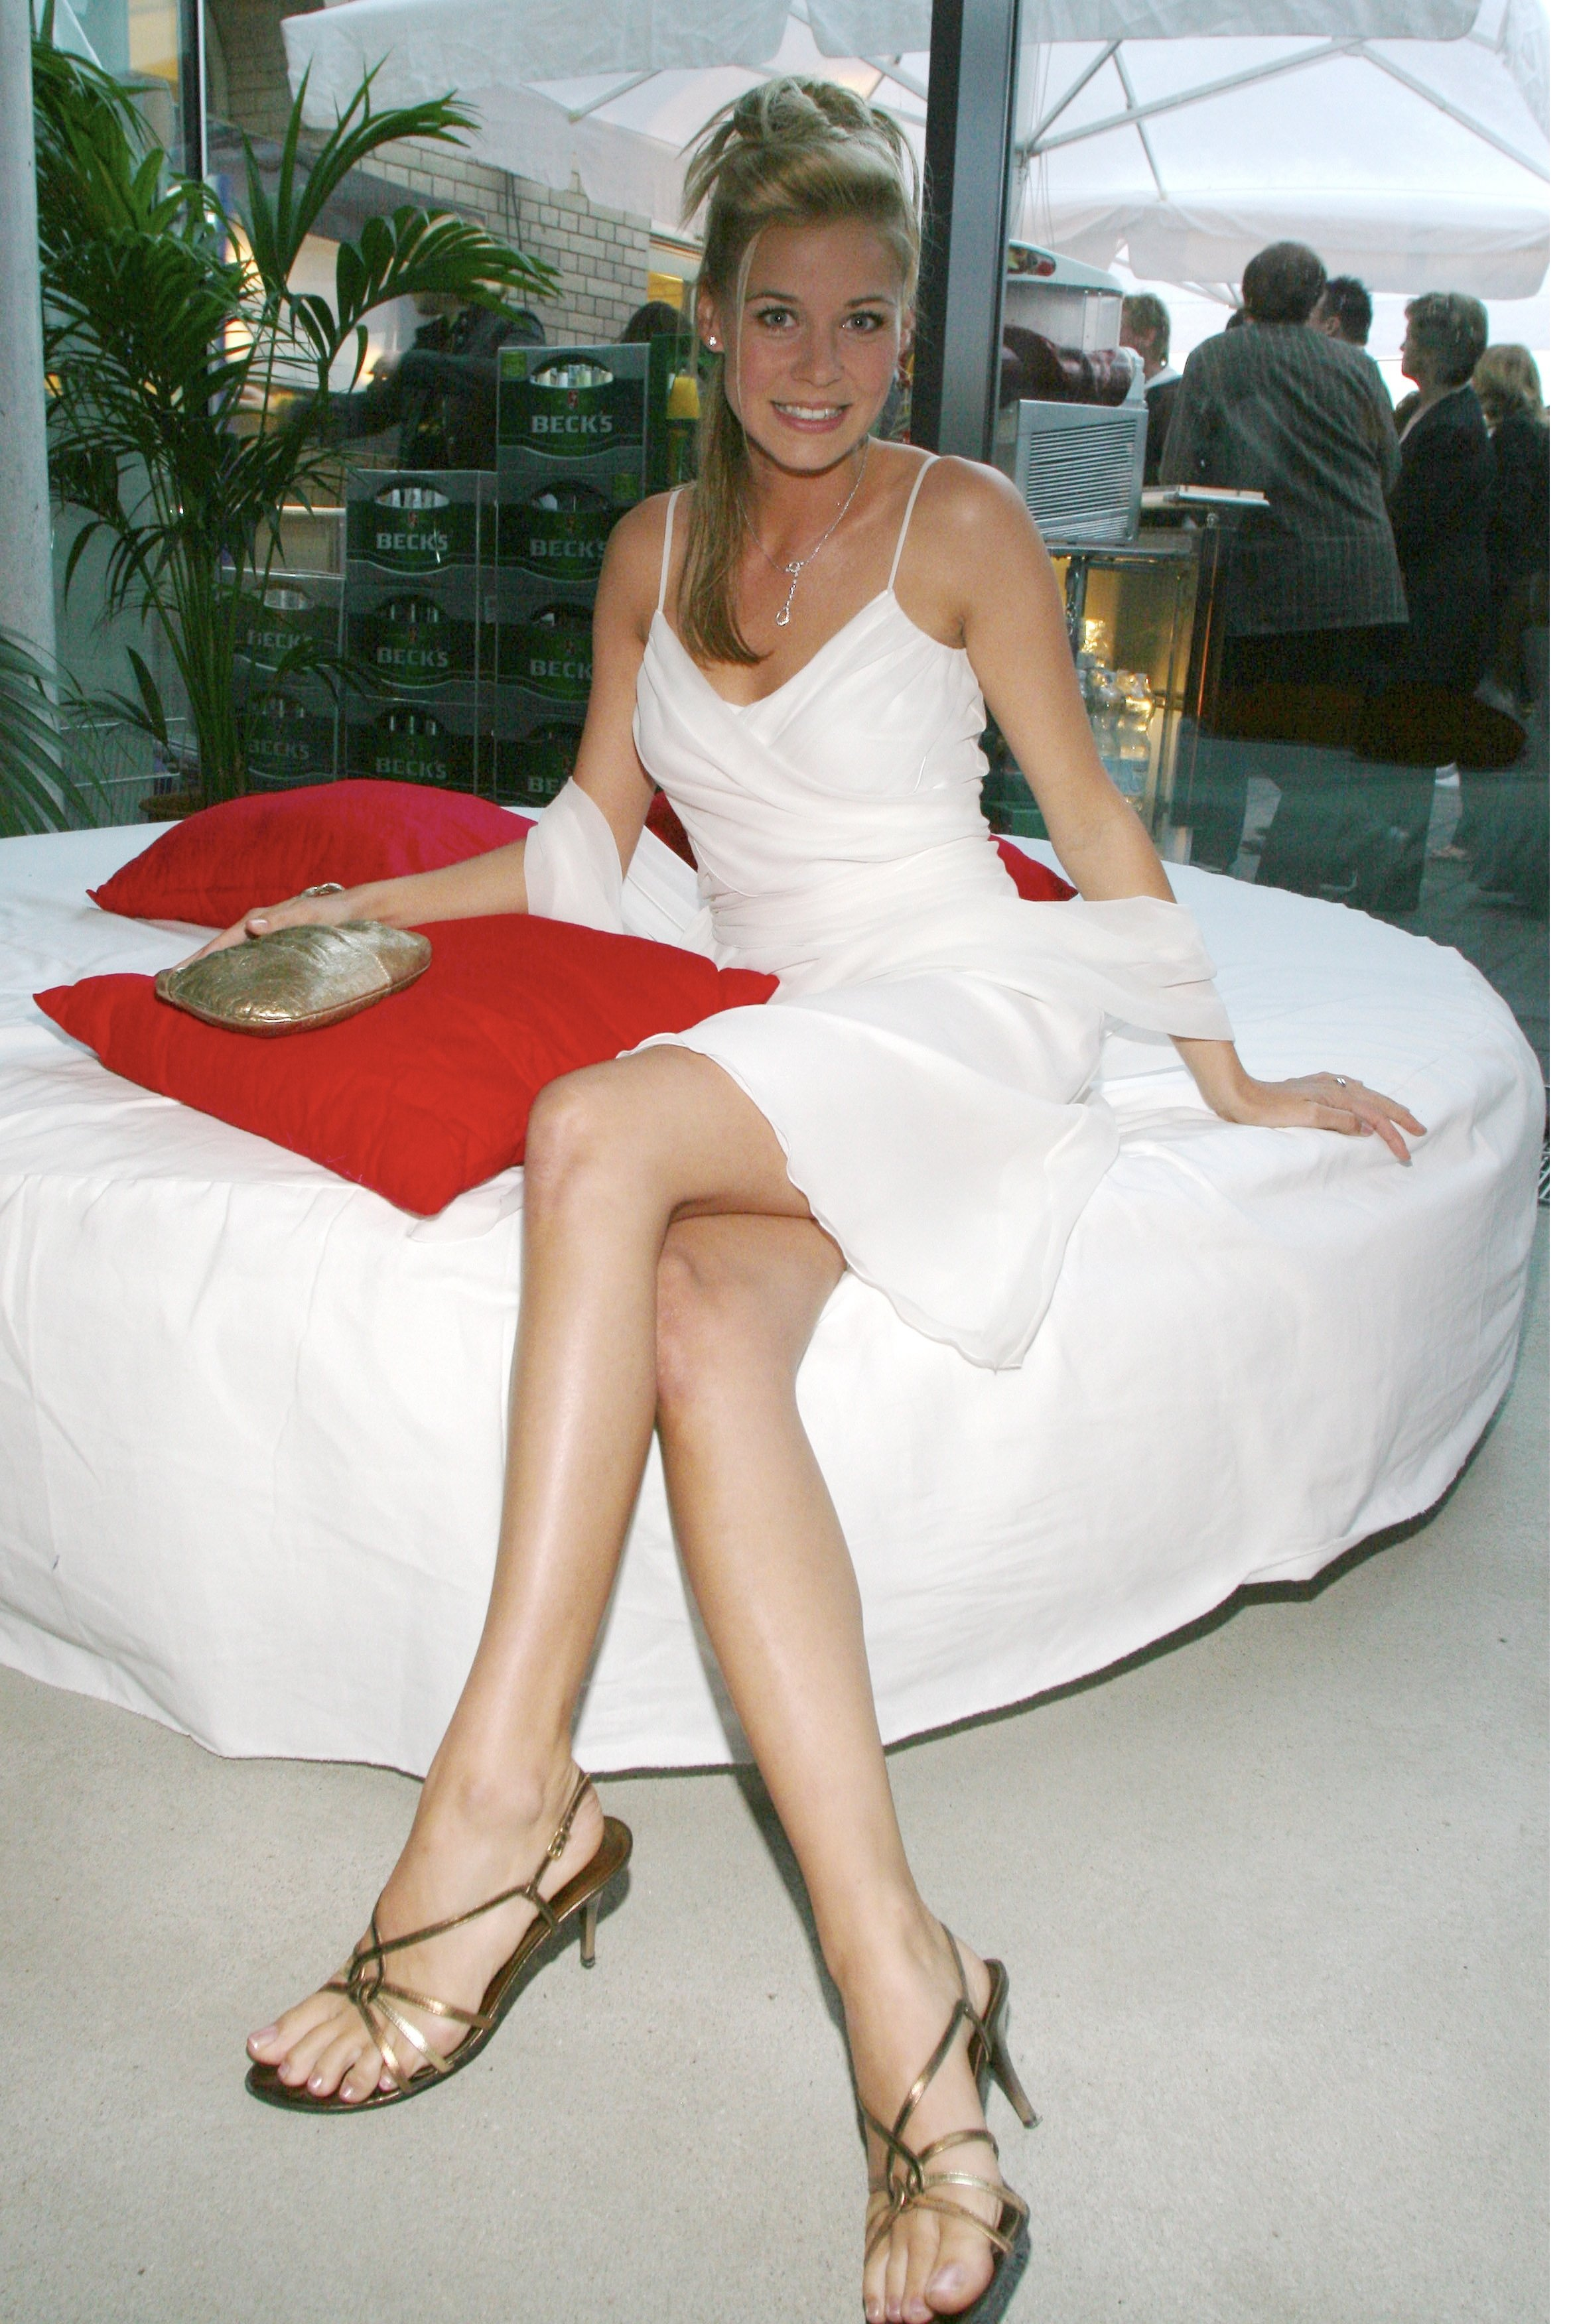 Julie taton nude picture 84